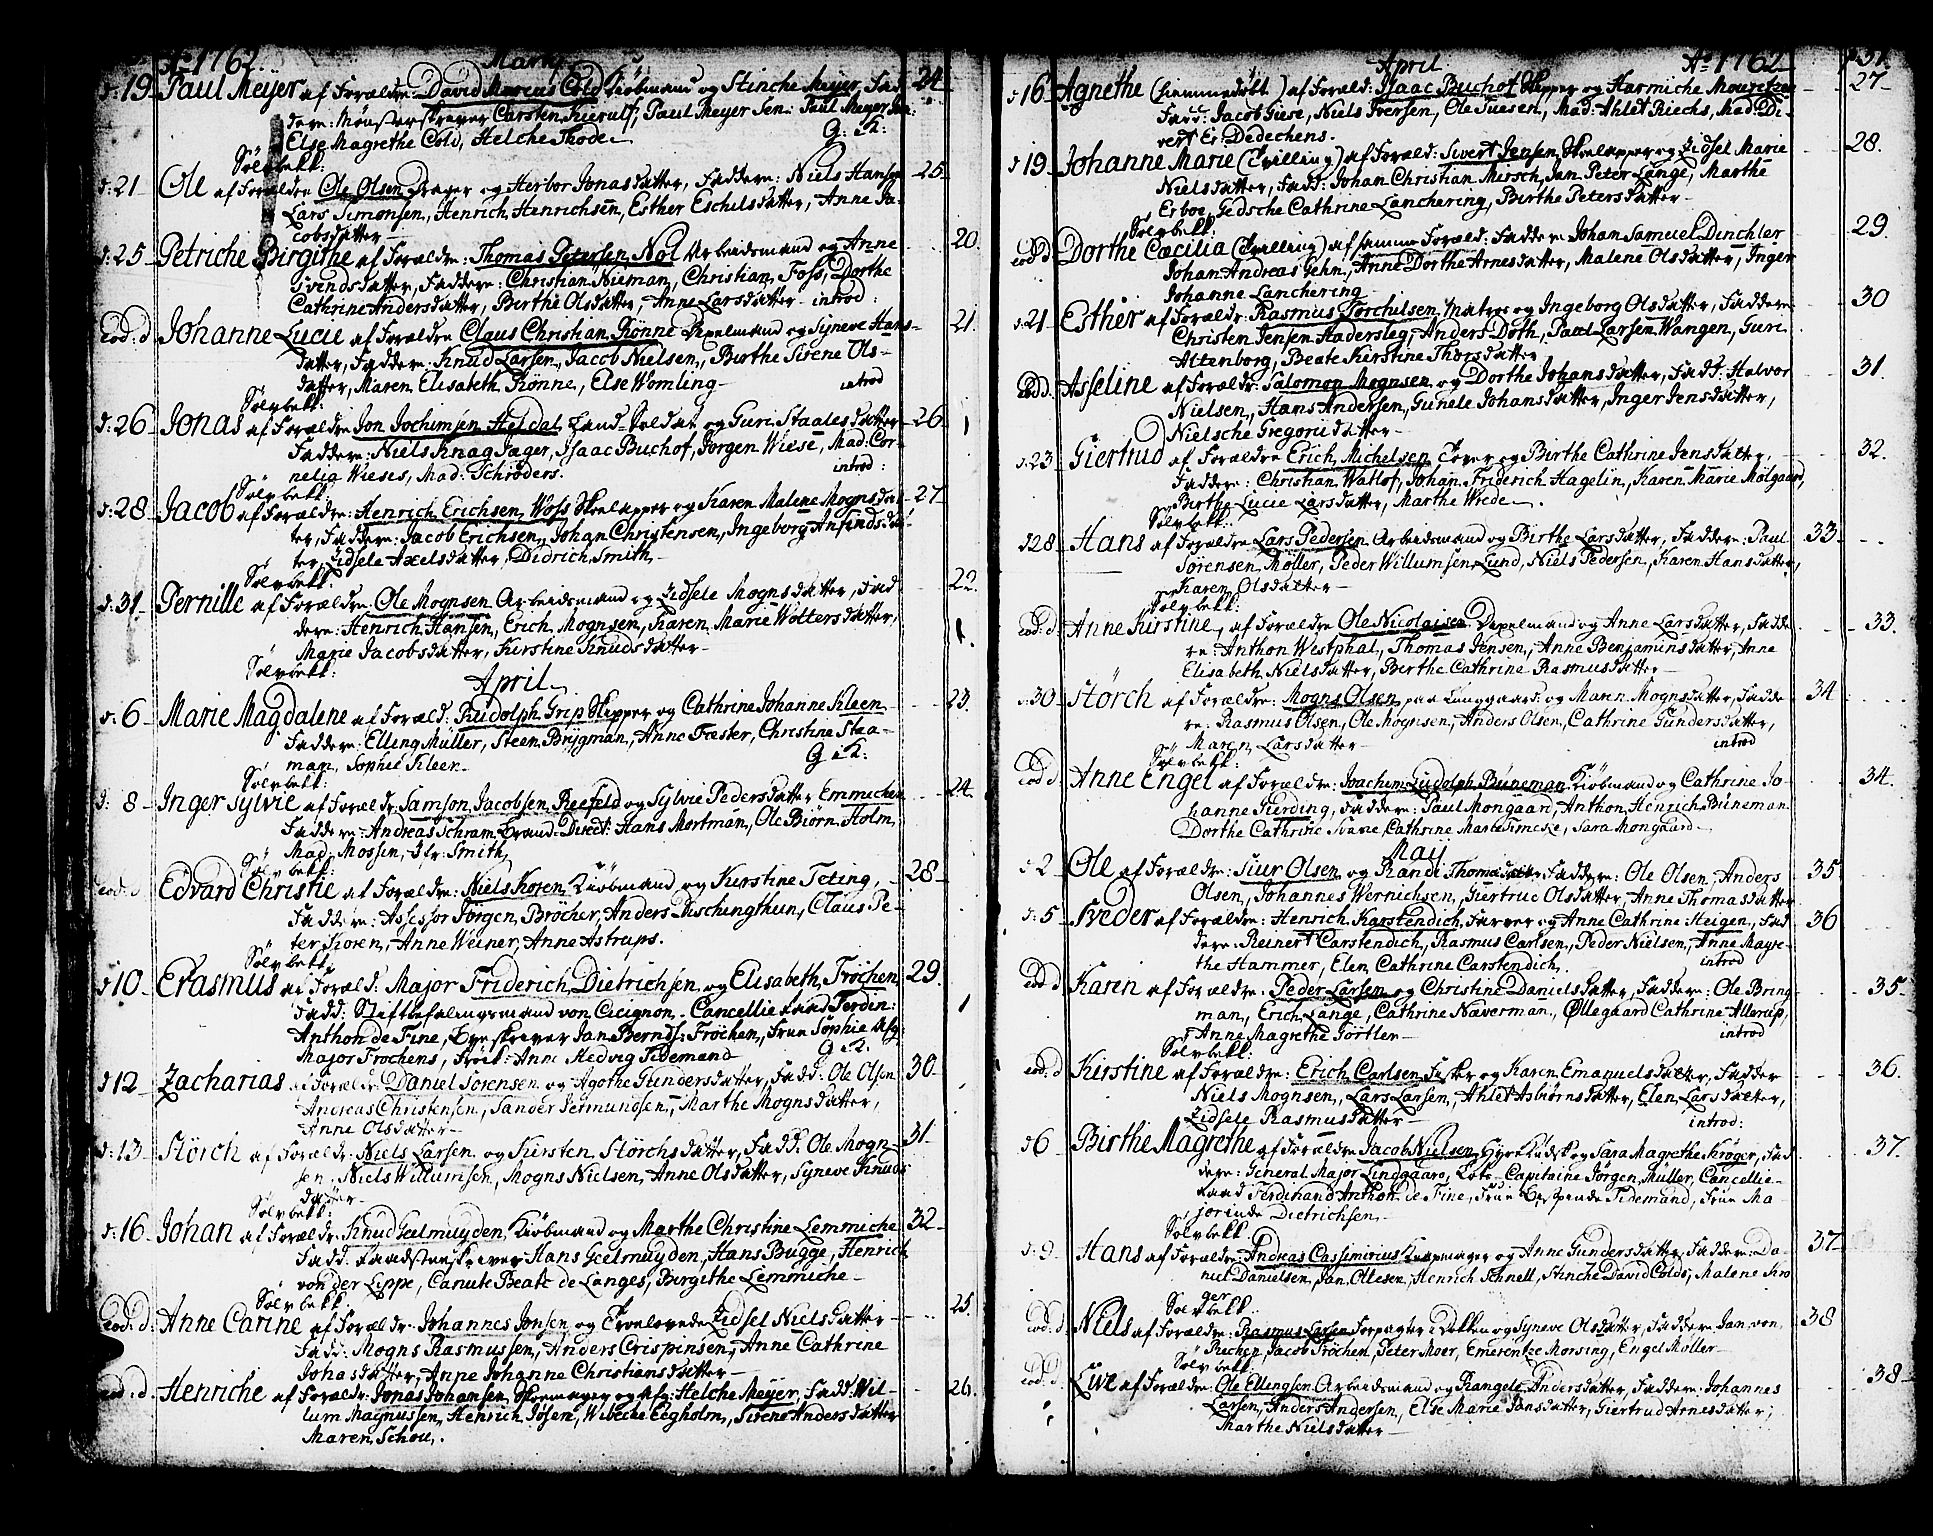 SAB, Domkirken Sokneprestembete, H/Haa/L0003: Ministerialbok nr. A 3, 1758-1789, s. 50-51